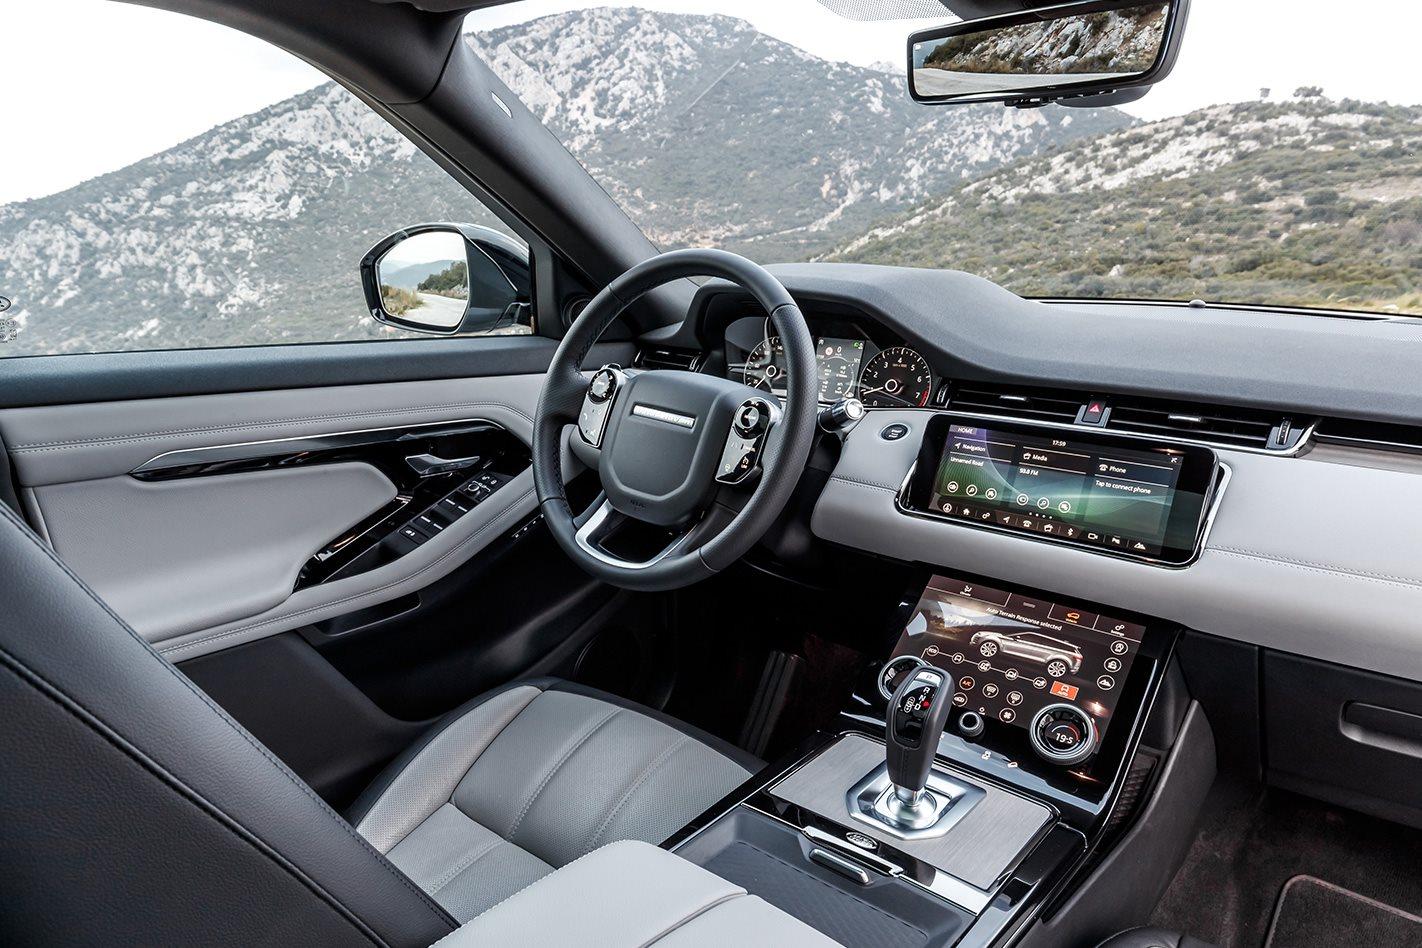 Range Rover Evoque Interior >> 4 Fakta Menarik Range Rover Evoque Terbaru Bukareview